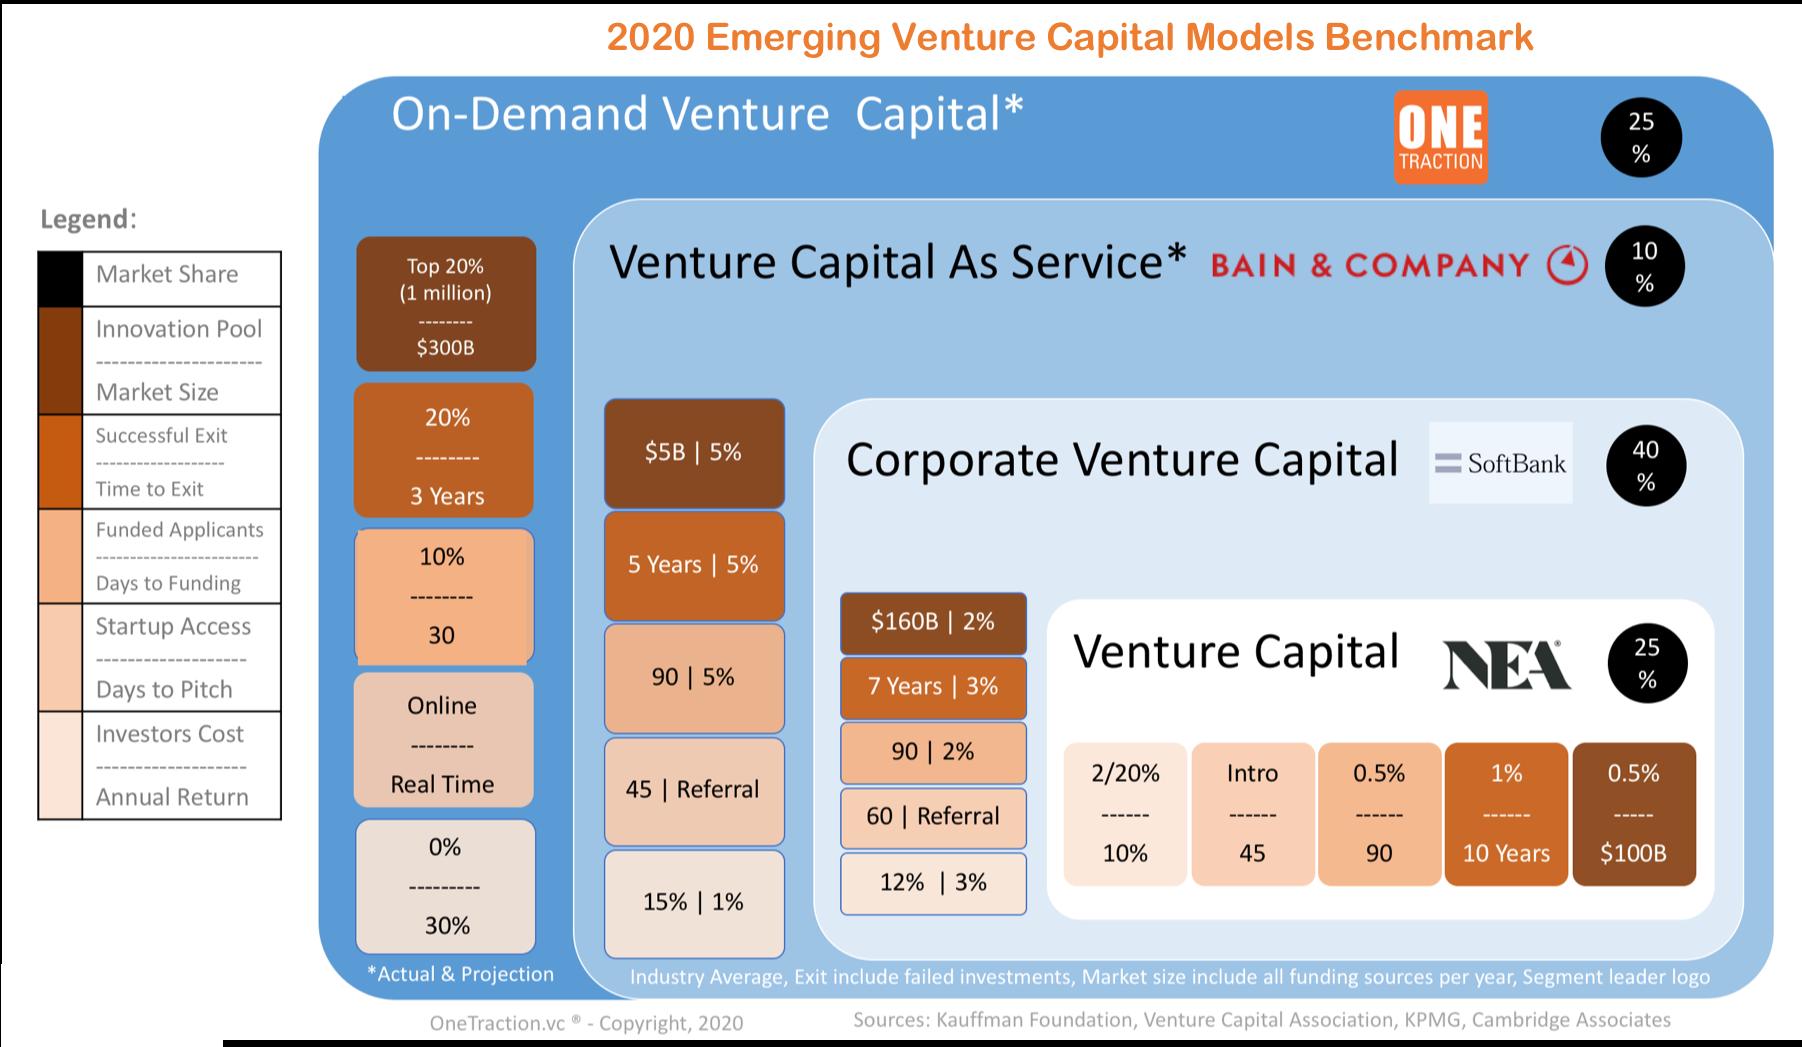 Figure 1: Venture Capital Models